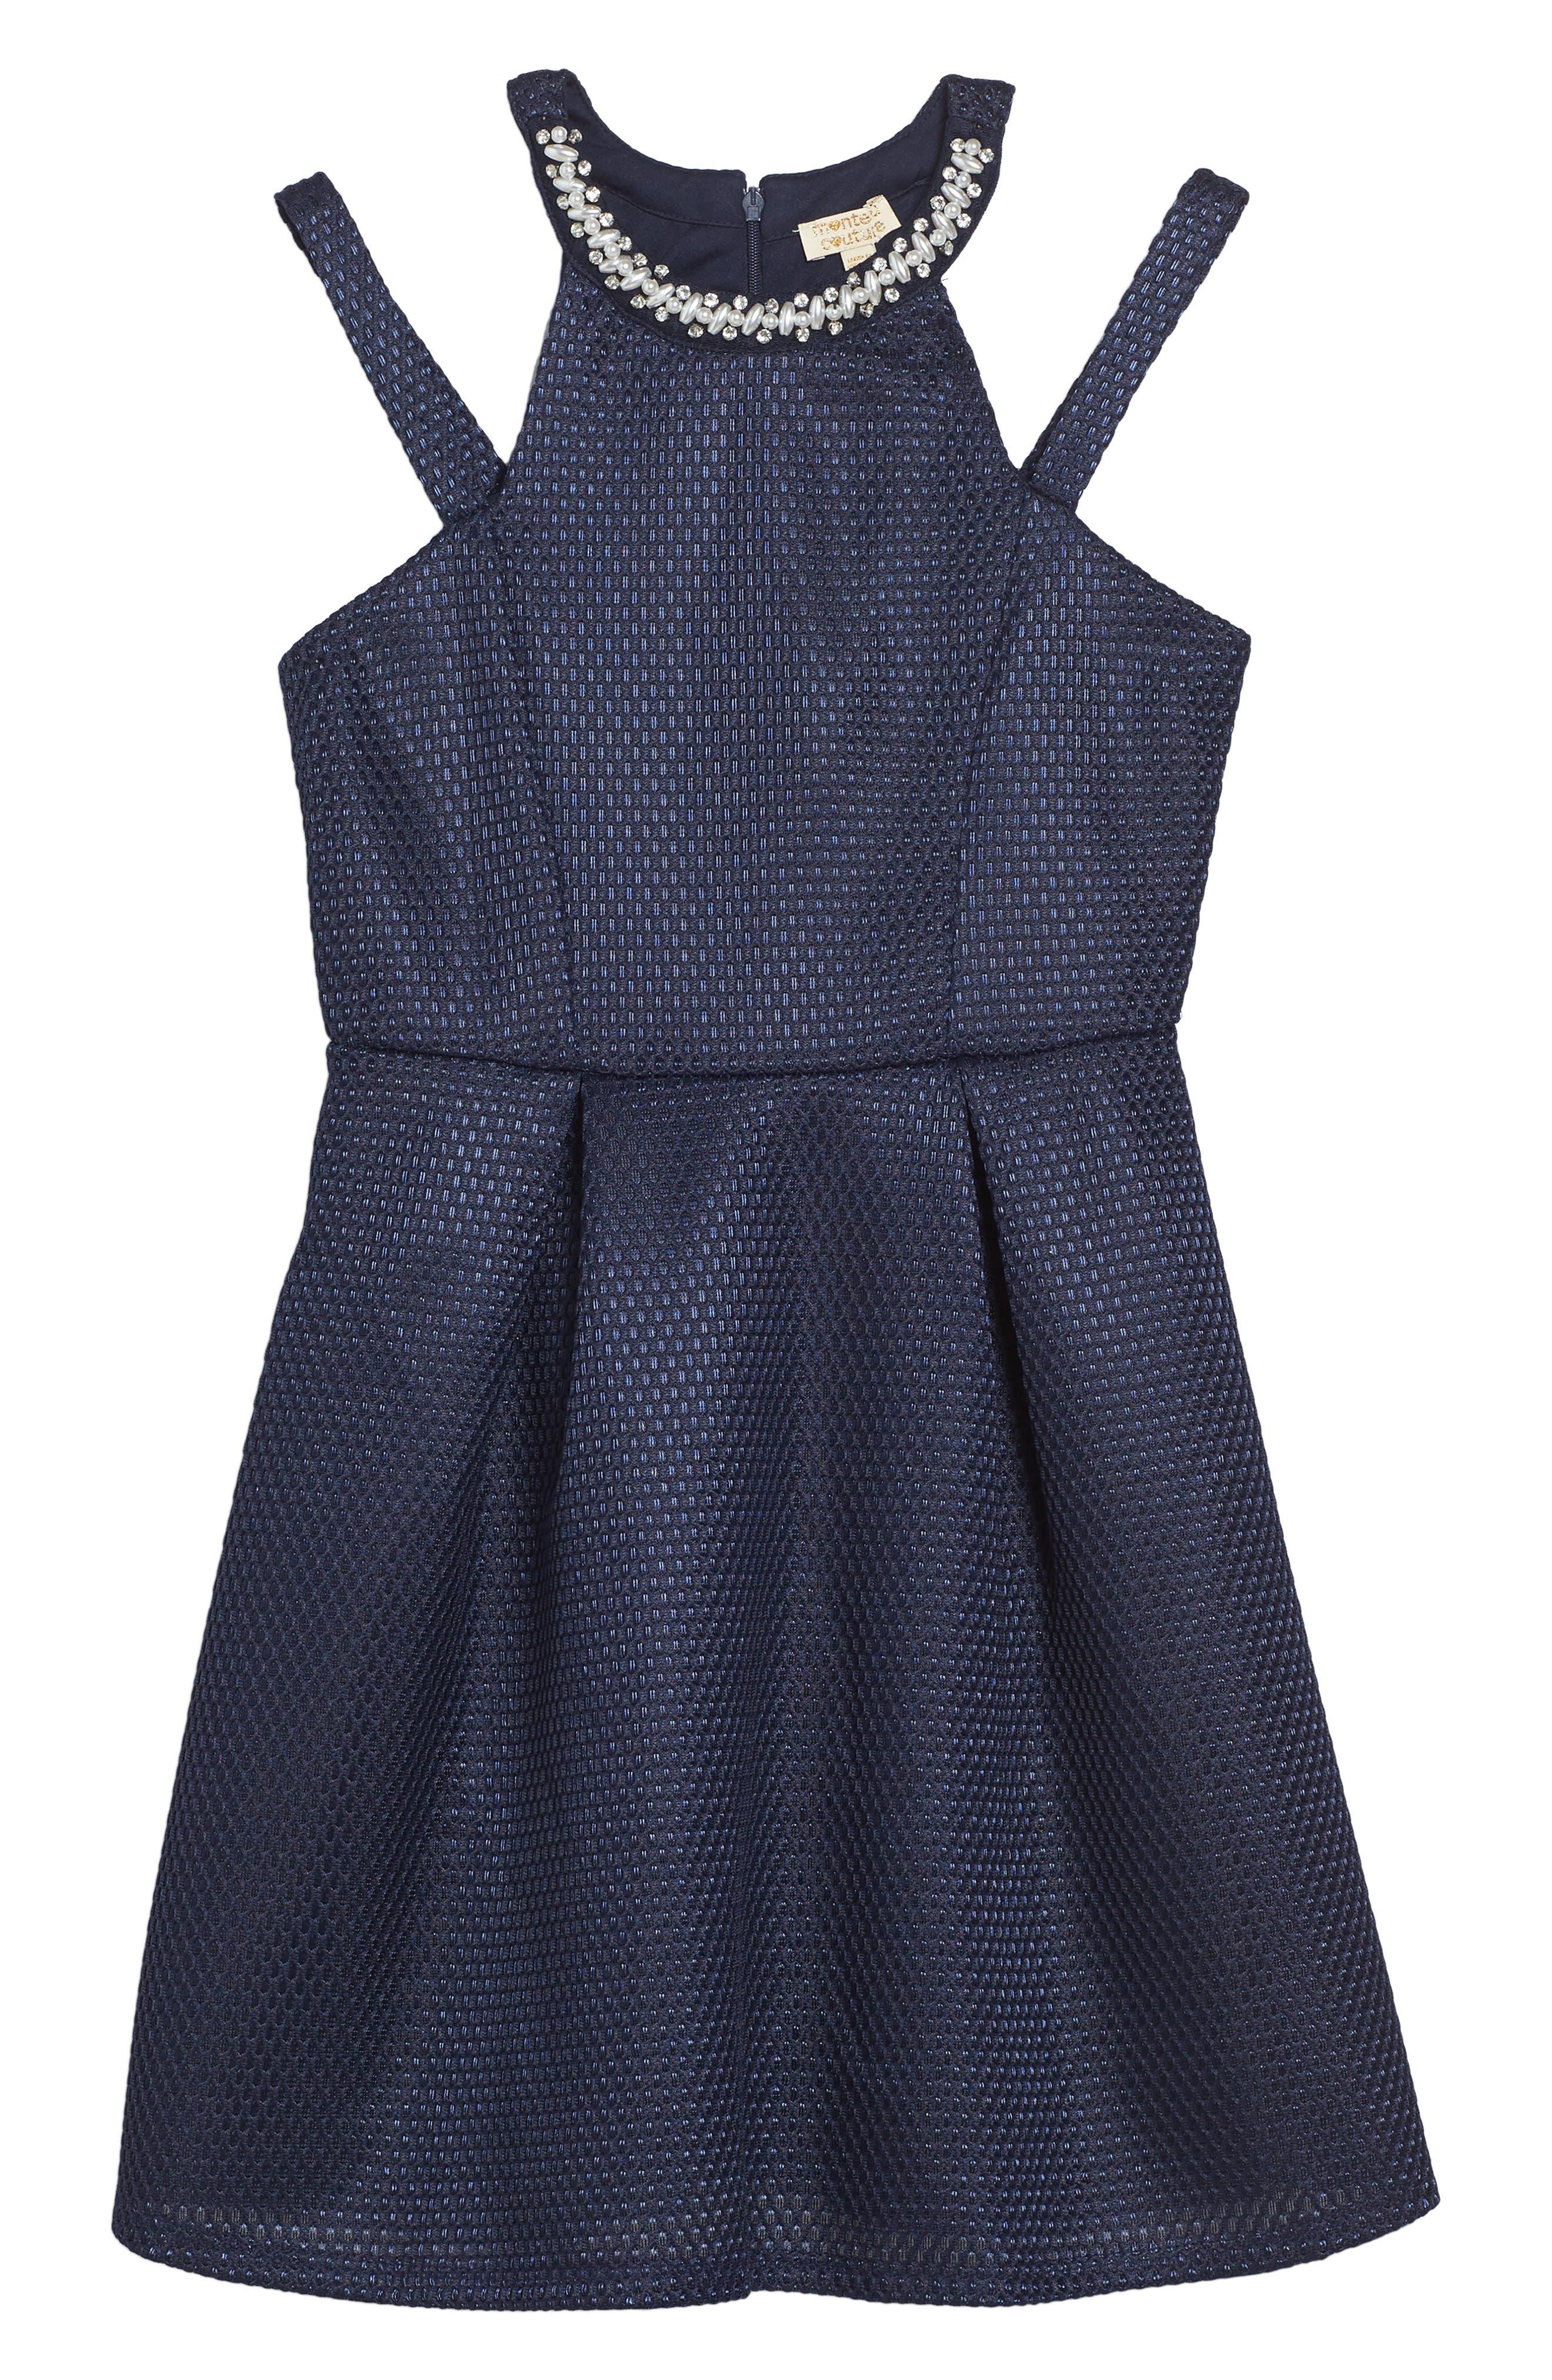 Monteau Couture Cold Shoulder Dress (Big Girls)